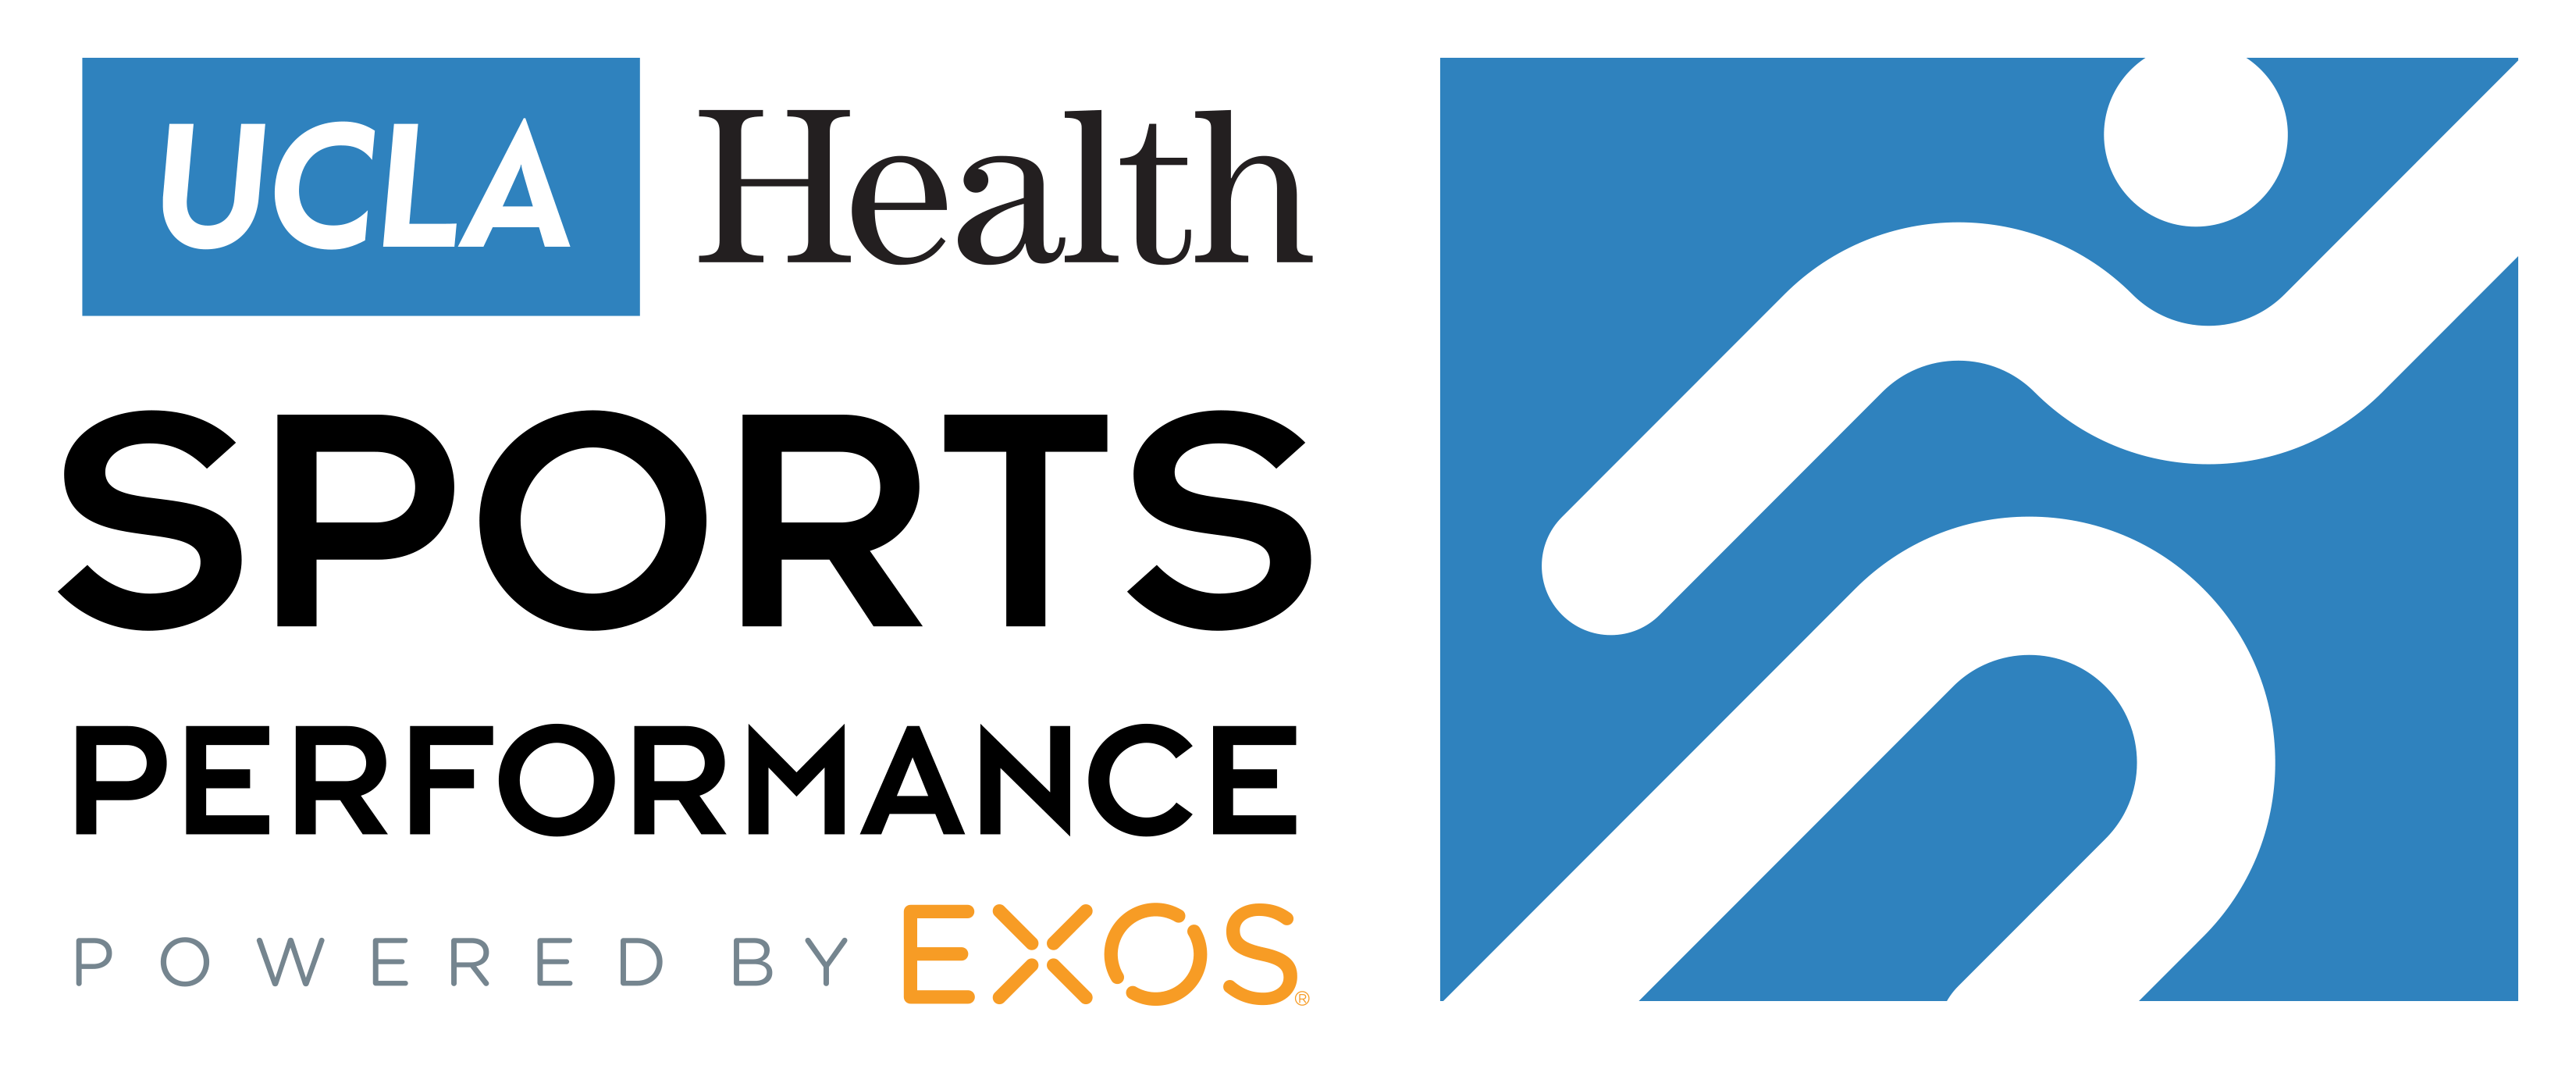 UCLA Health Sports Performance